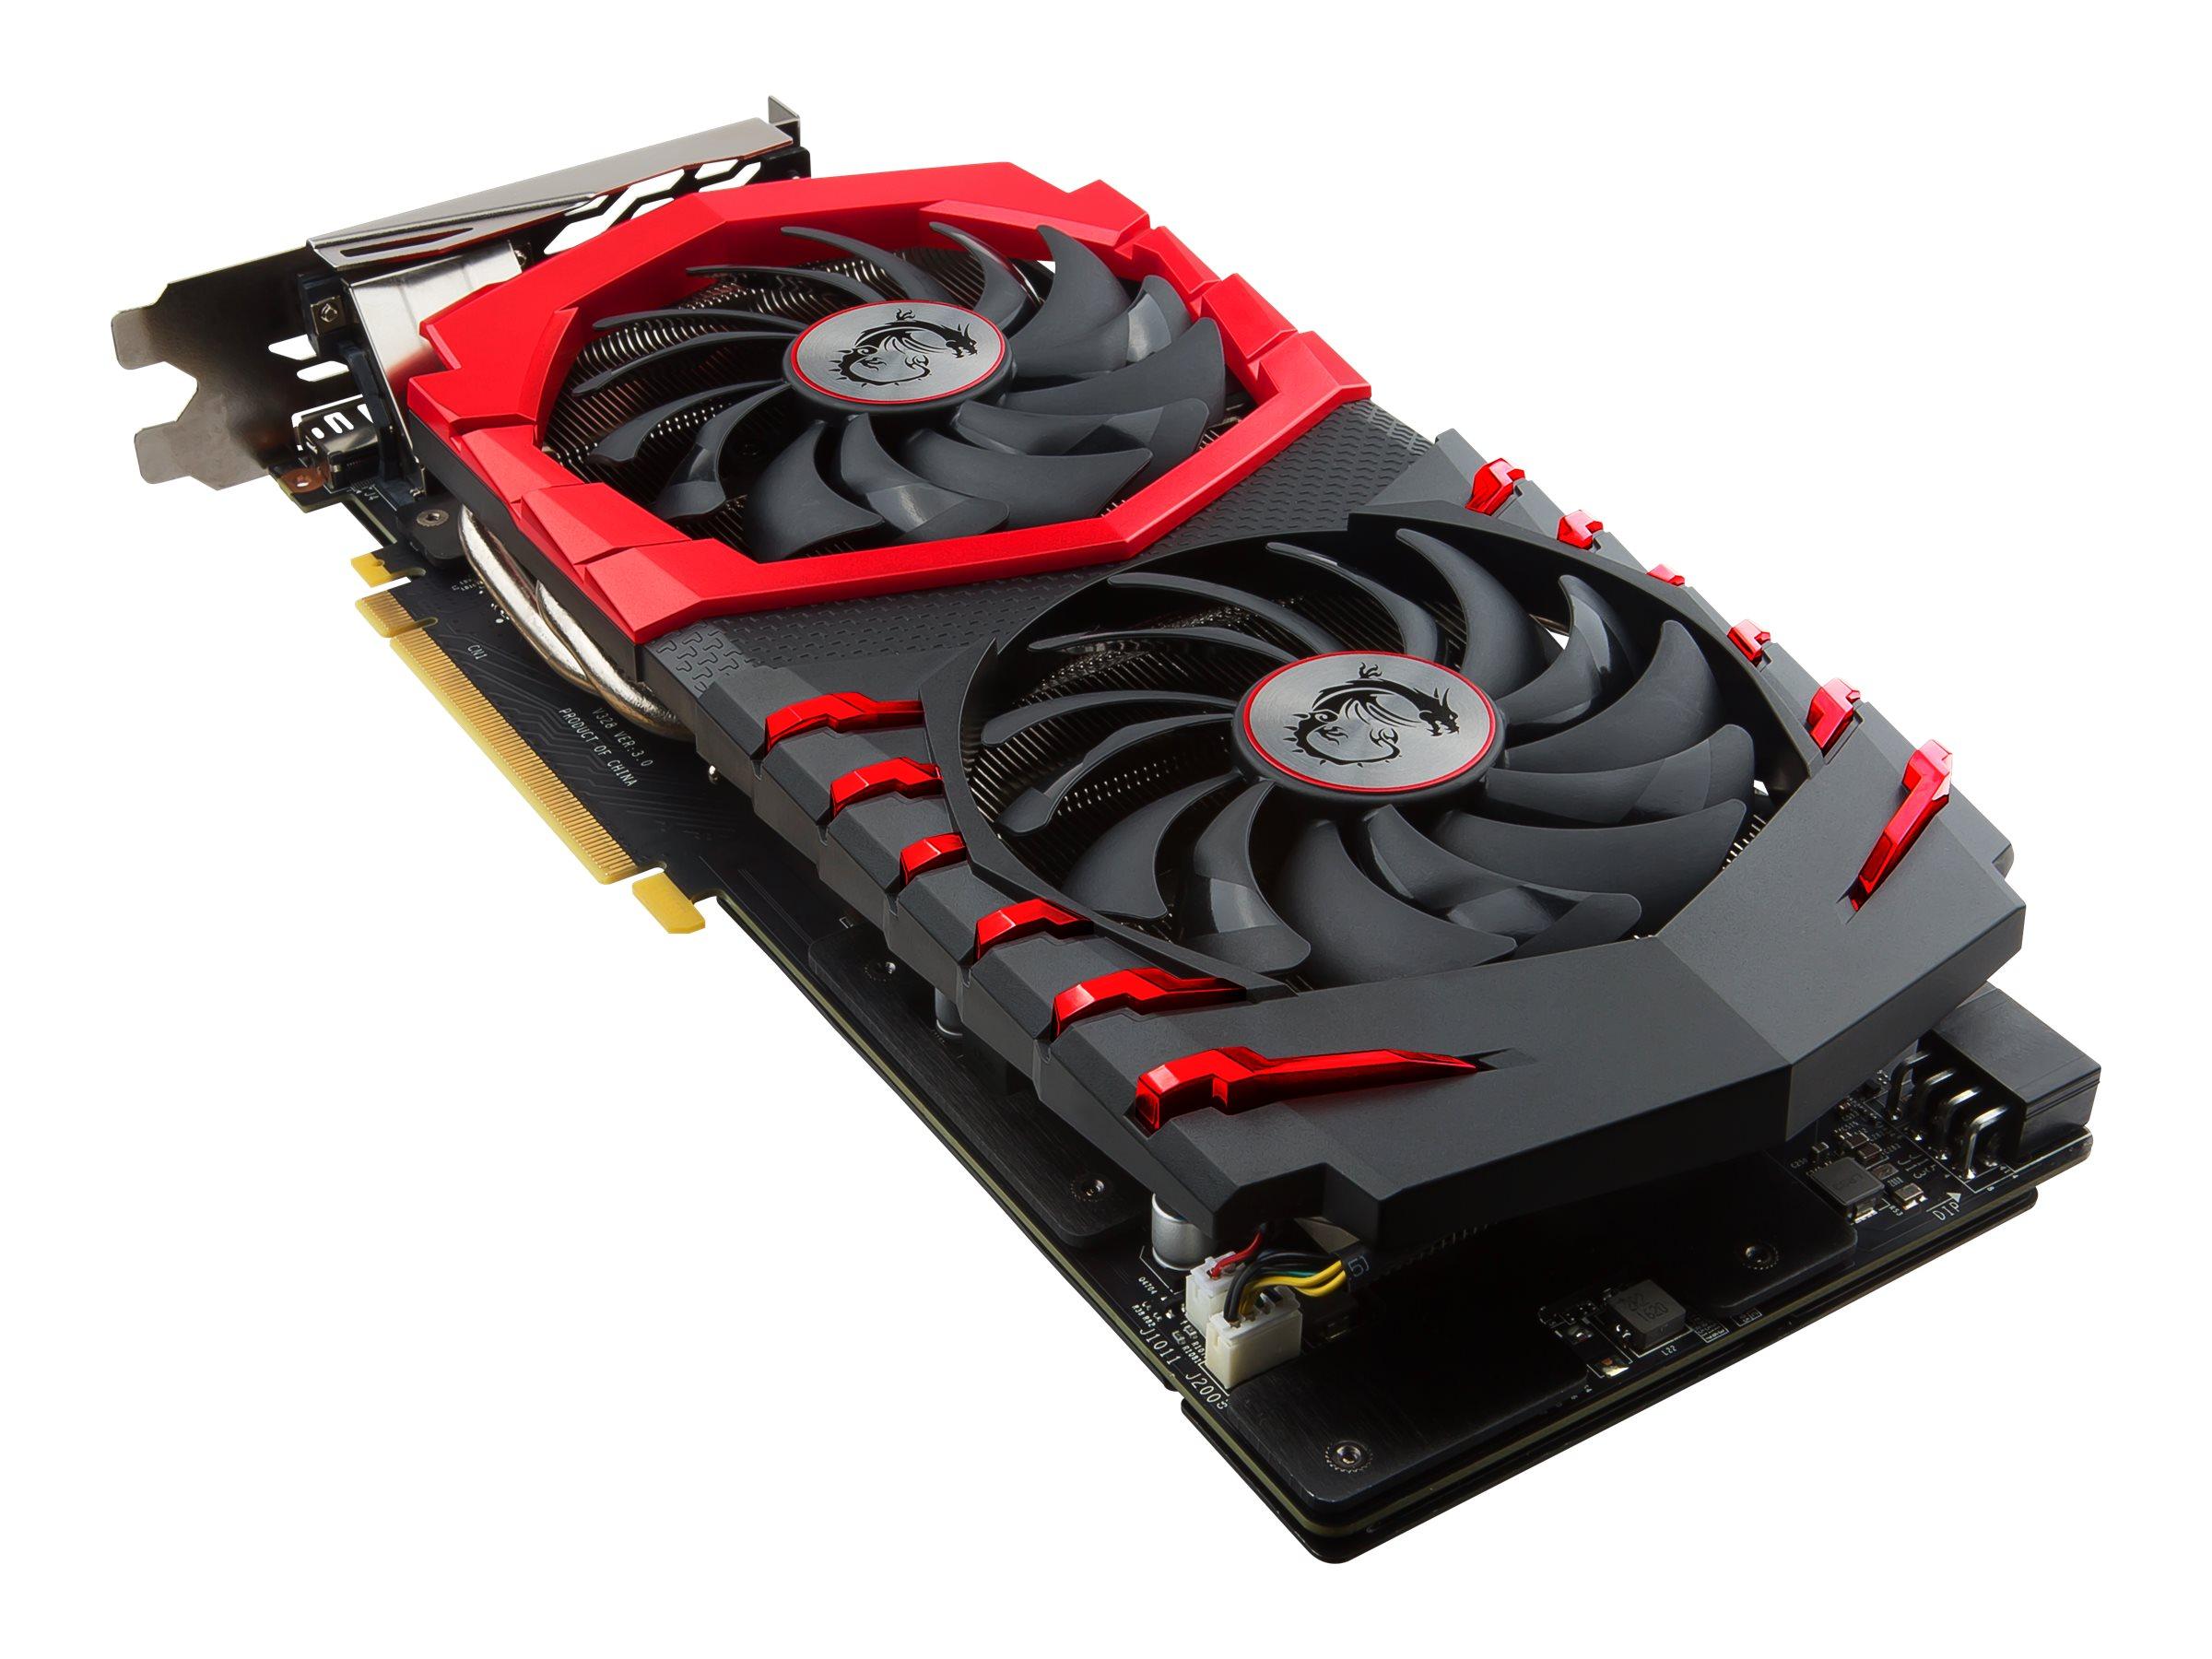 MSI GTX 1060 GAMING X 3G - Grafikkarten - GF GTX 1060 - 3 GB GDDR5 - PCIe 3.0 x16 - DVI, HDMI, 3 x DisplayPort